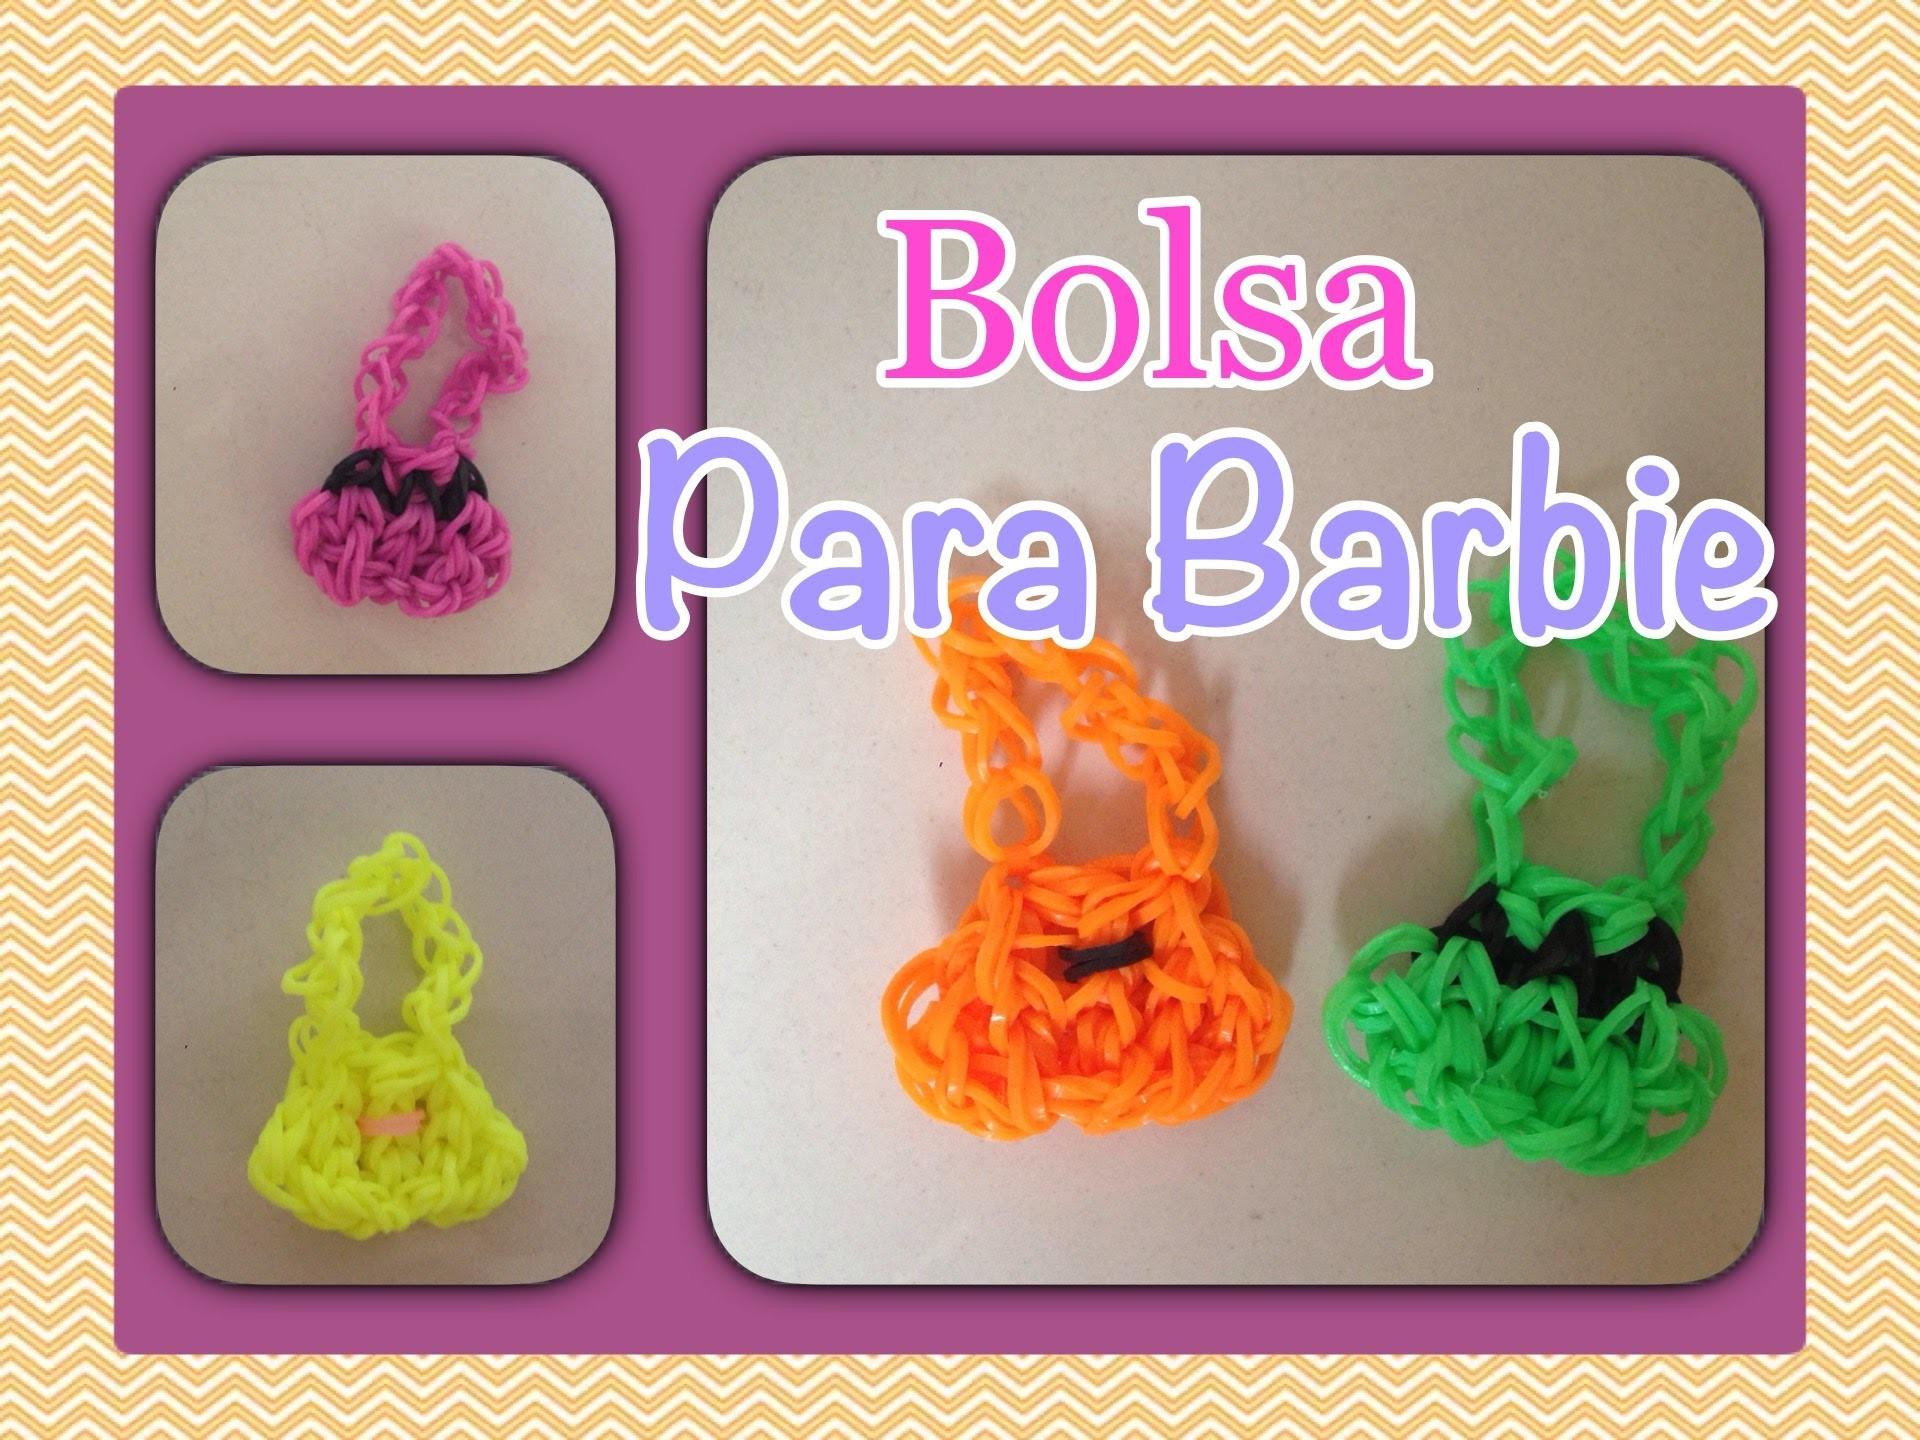 Rainbow Loom - Bolsa para Barbie   Criativa